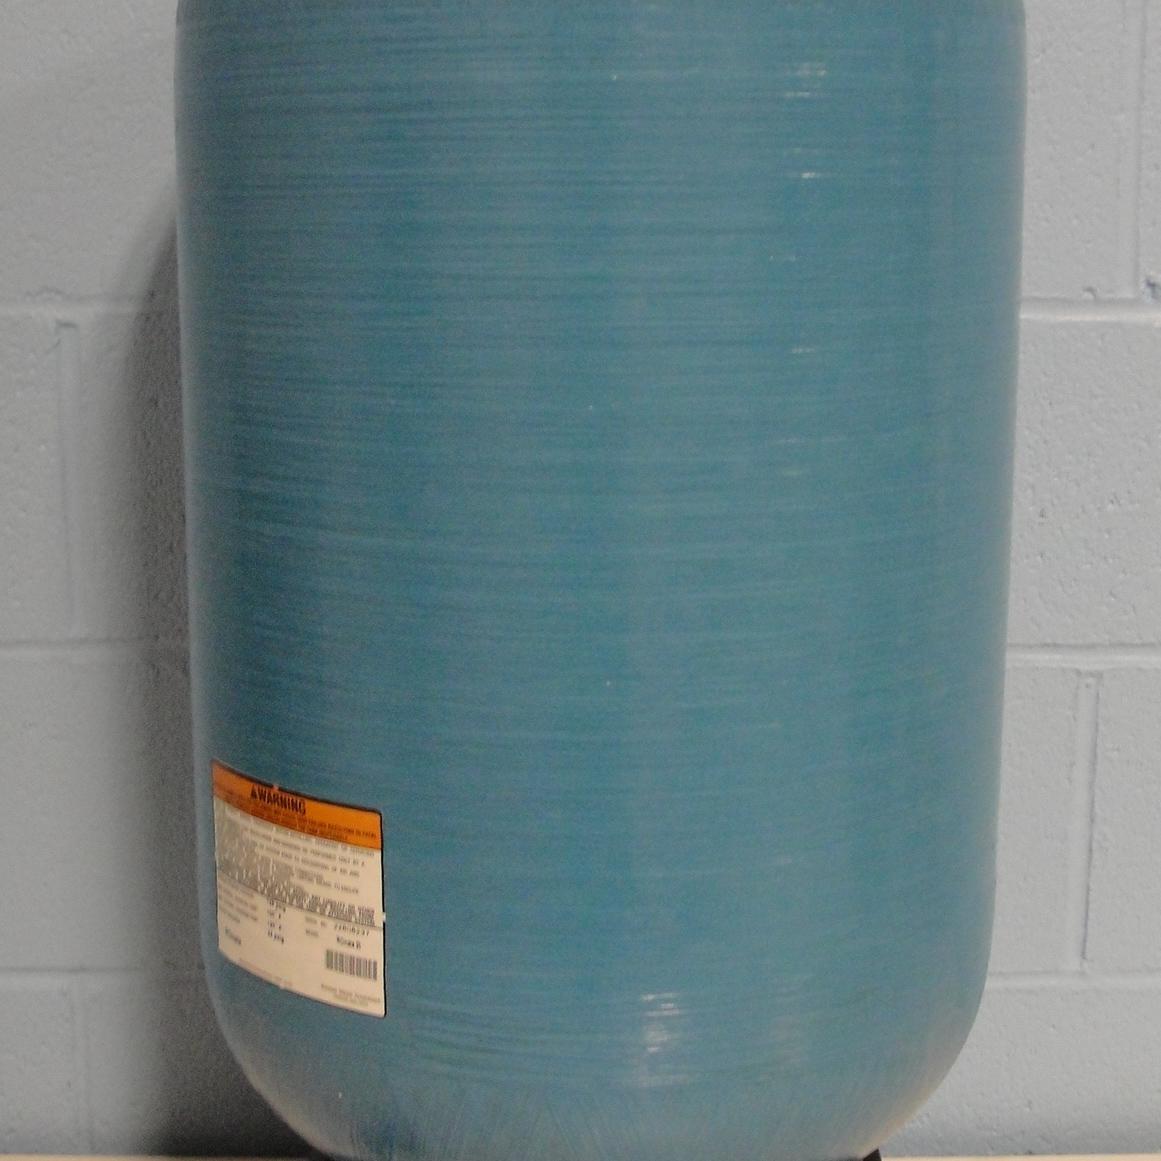 Pentair Structural ROMATE-20 Fiberglass Reverse Osmosis Storage Tank Image